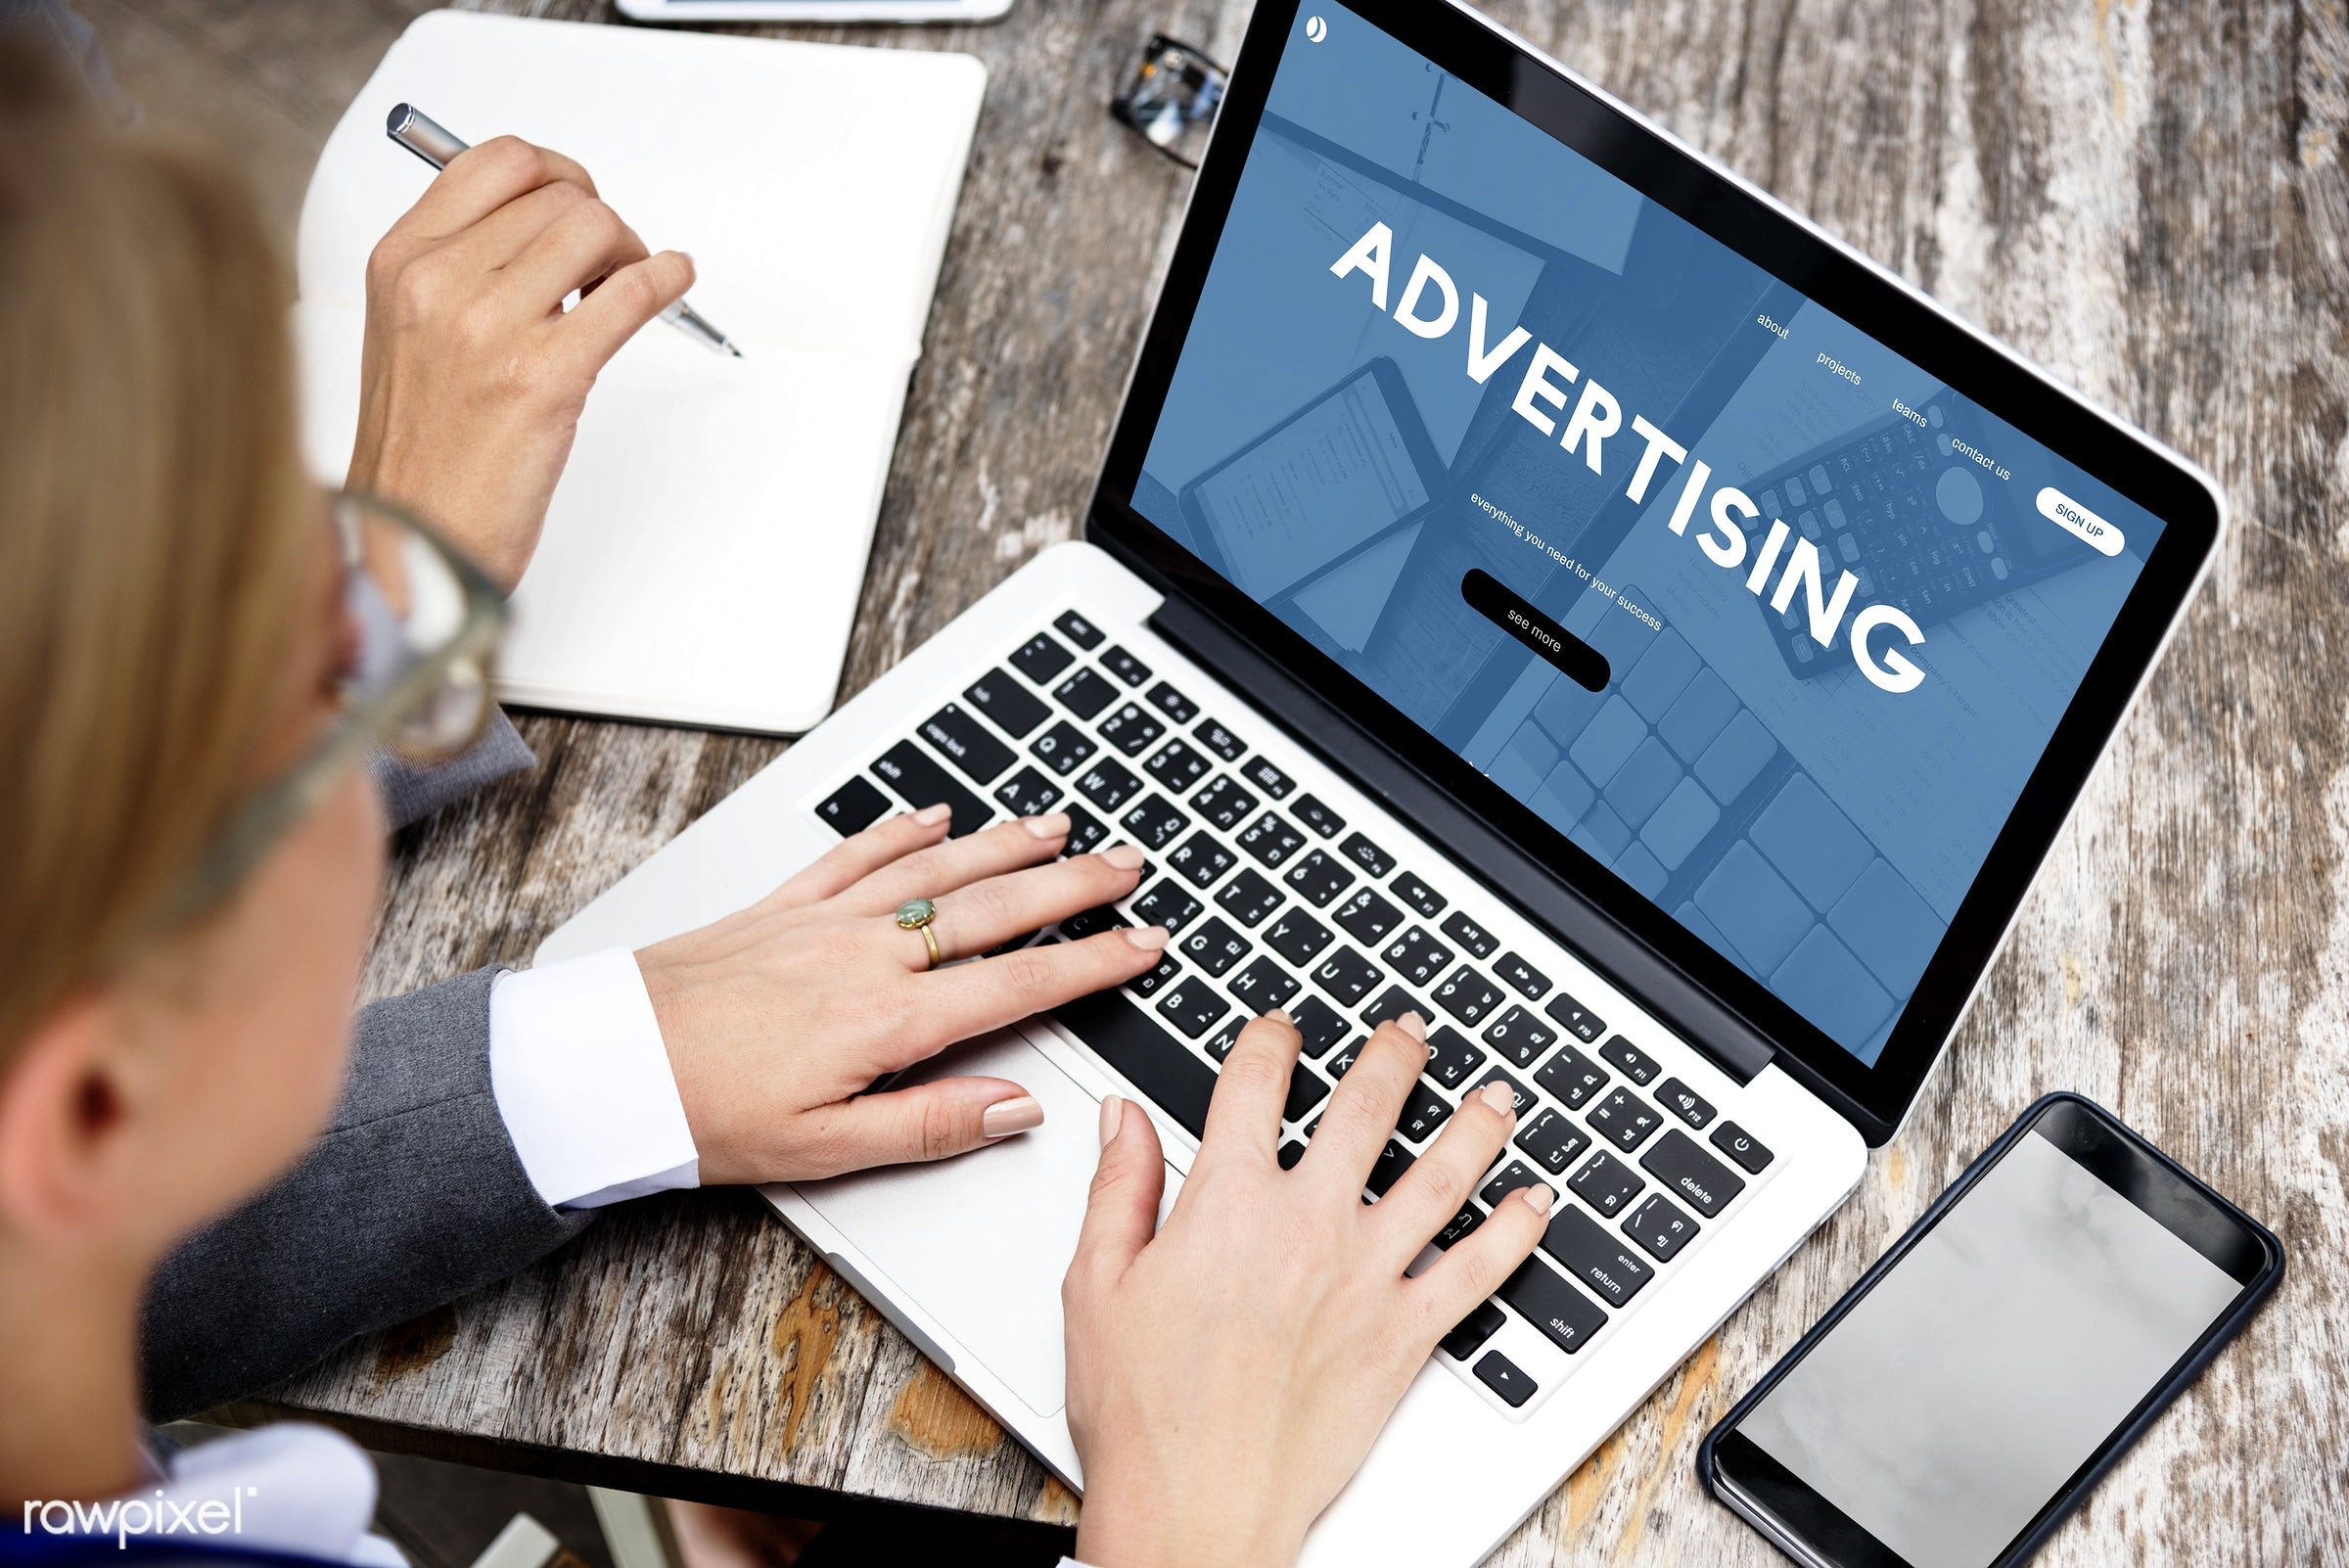 advertise, advertisement, advertising, branding, business, businesspeople, businessperson, businesswoman, businesswomen,...